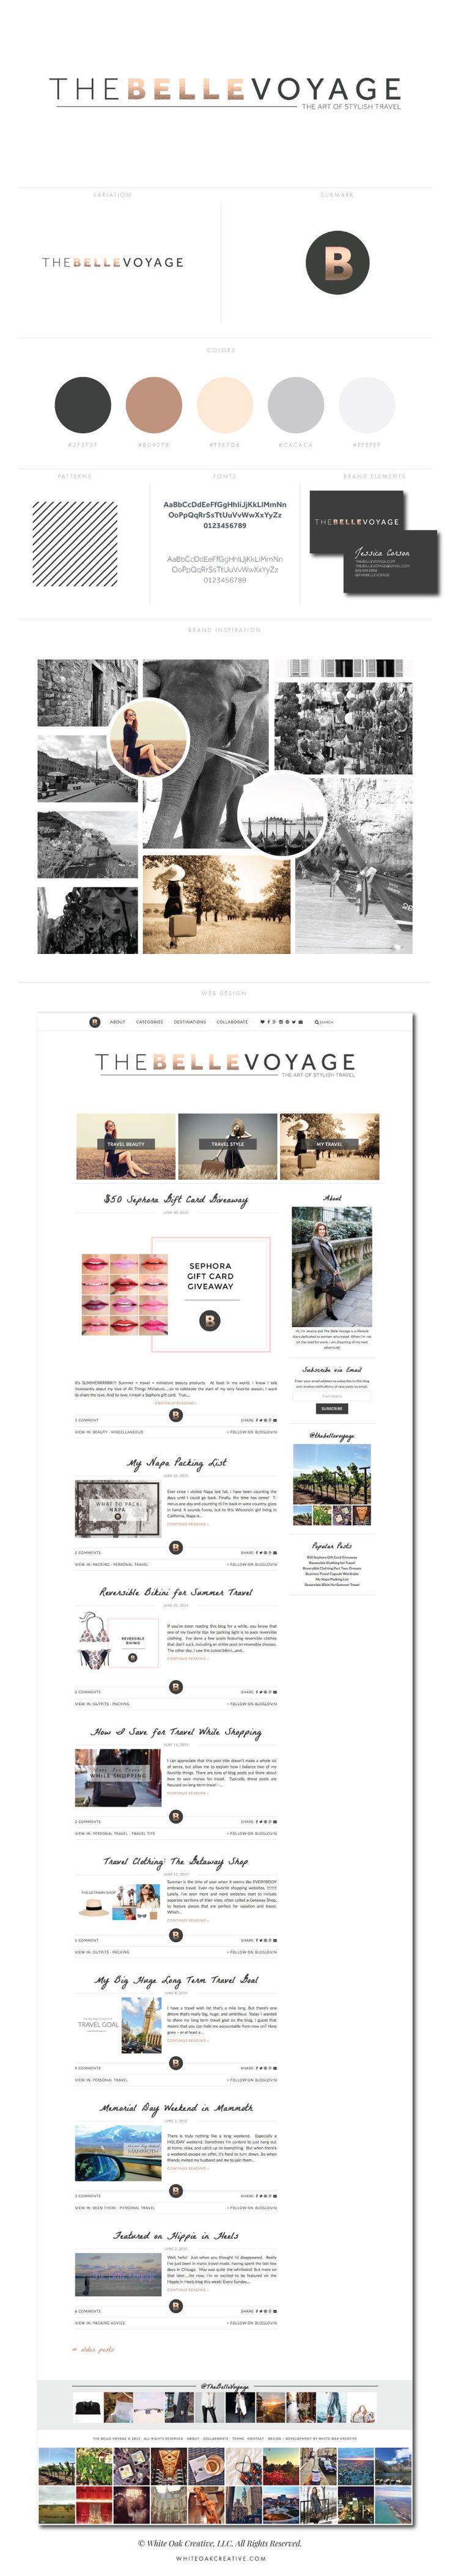 The Belle Voyage WordPress Blog Design - logo design, wordpress theme, mood board inspiration, blog design idea, graphic design, branding